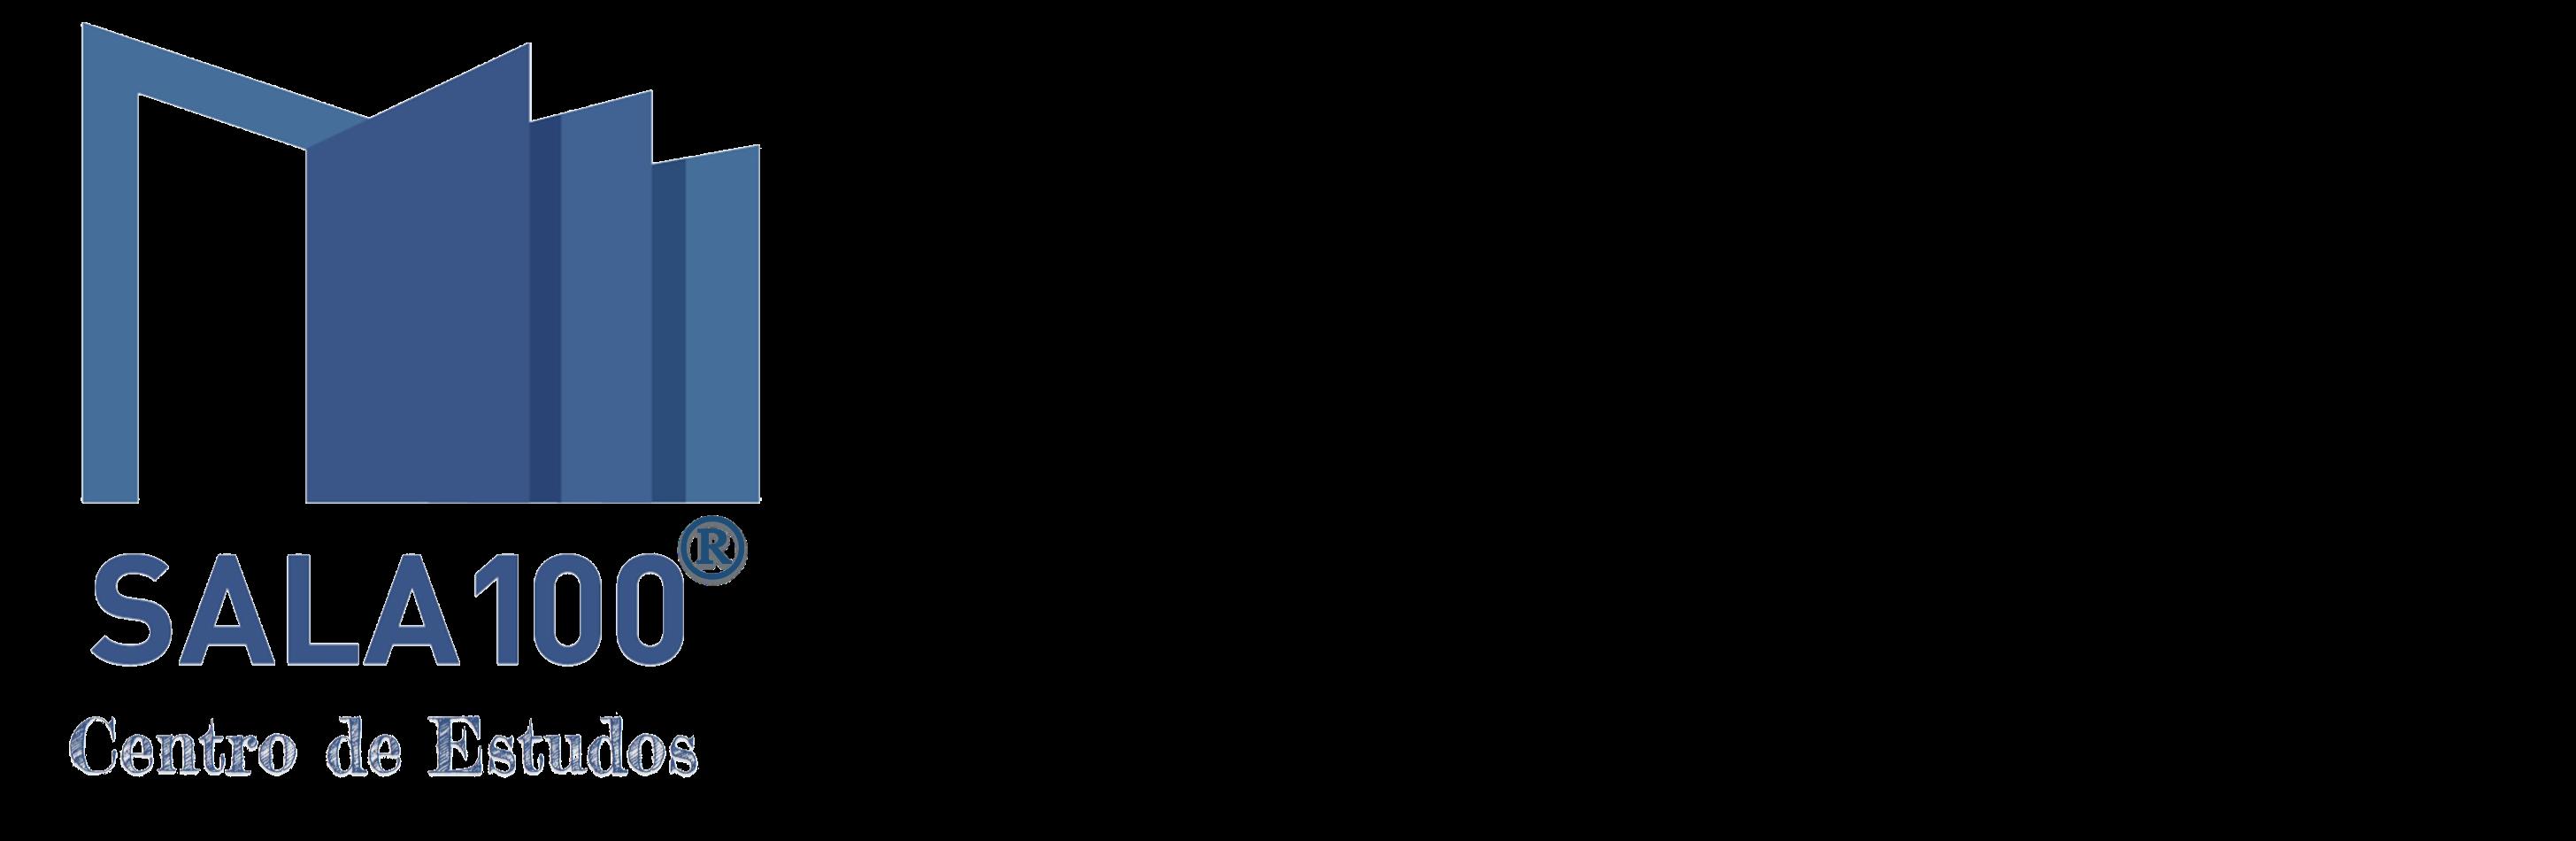 Sala100